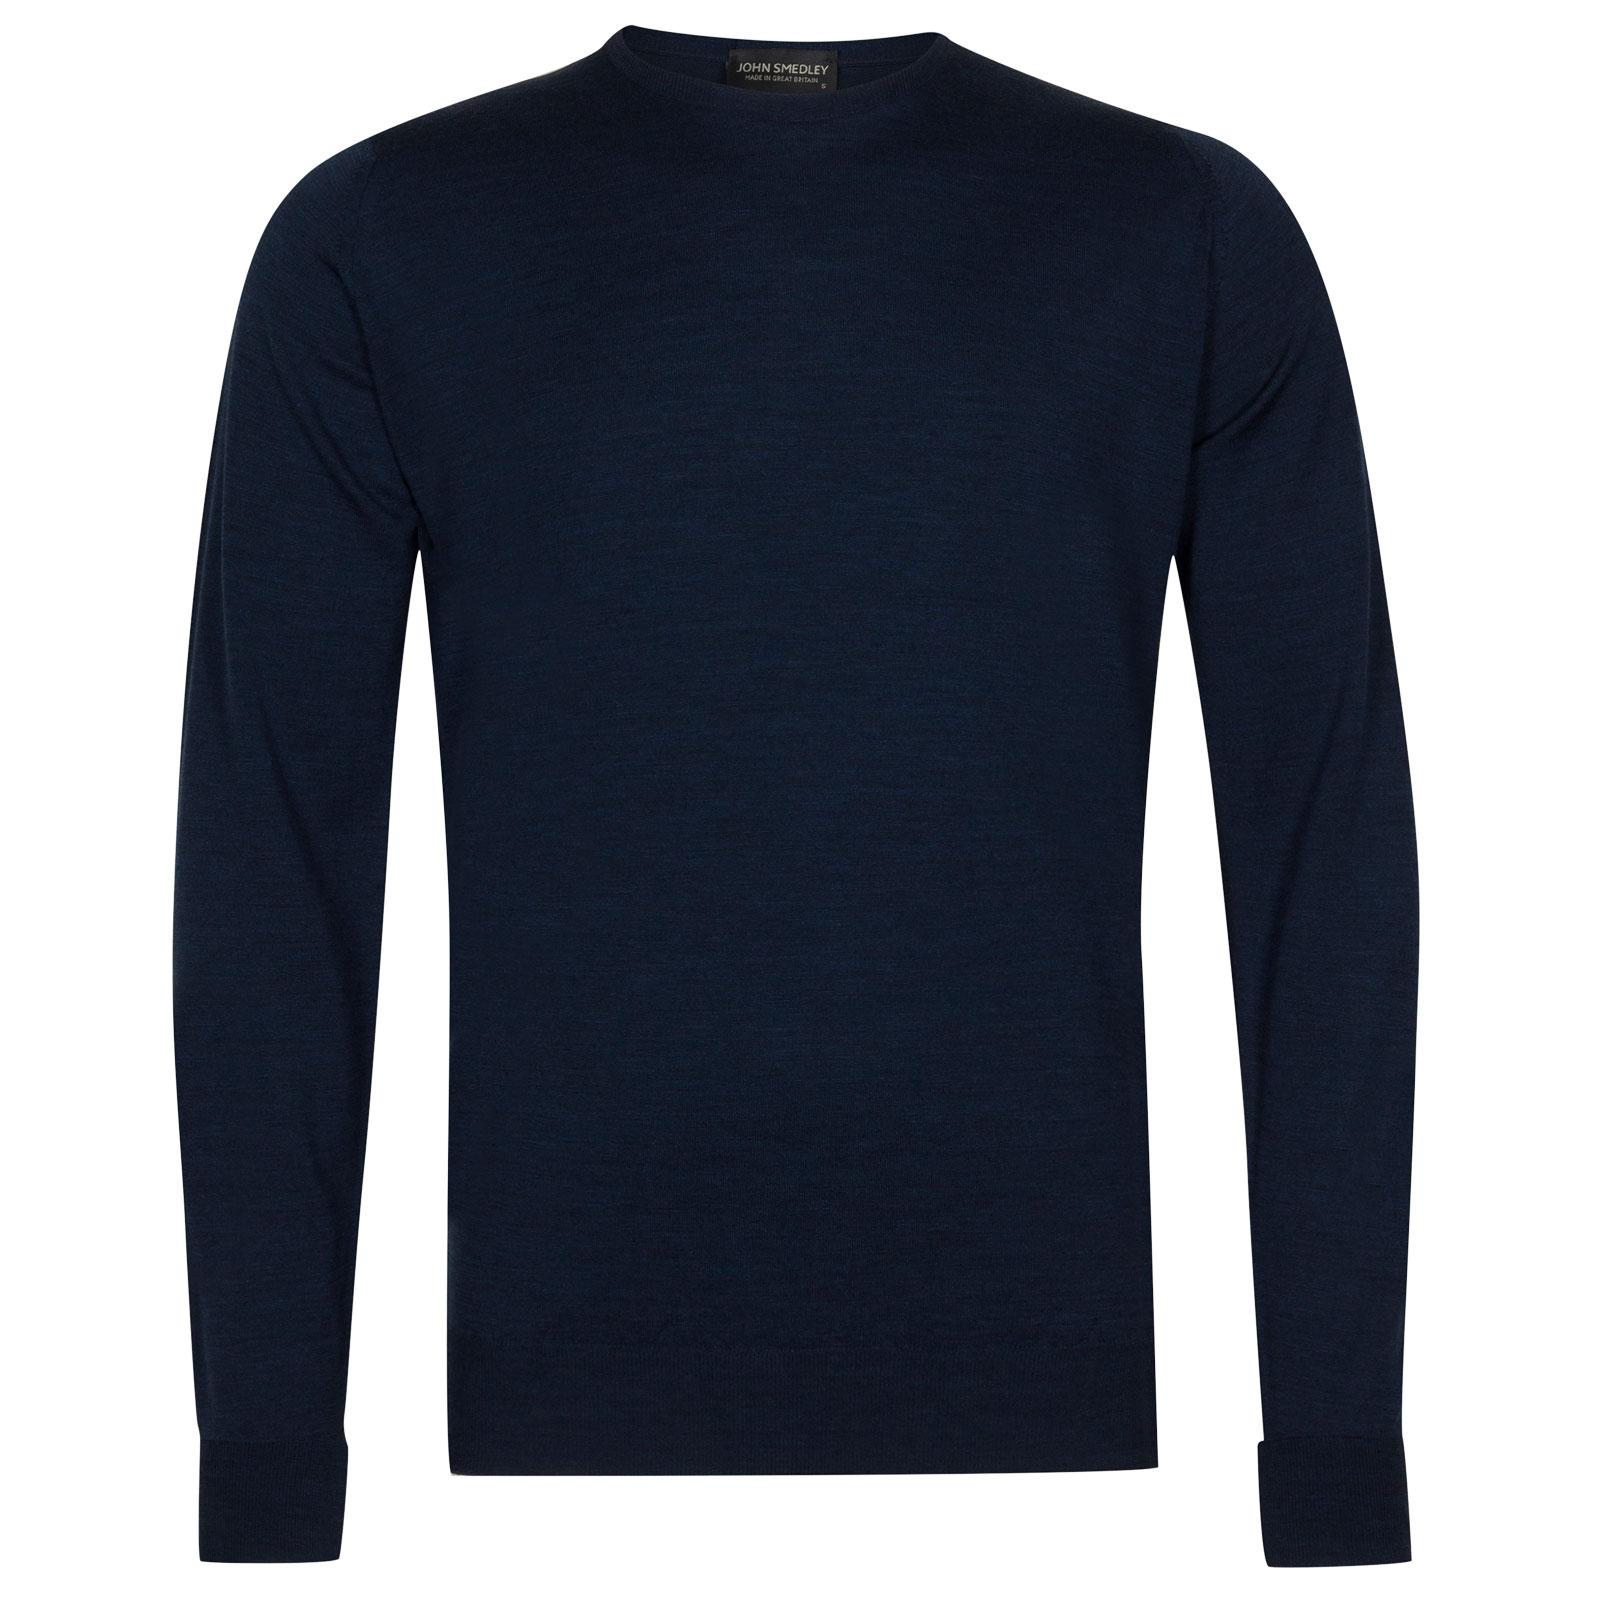 John Smedley marcus Merino Wool Pullover in Indigo-XL